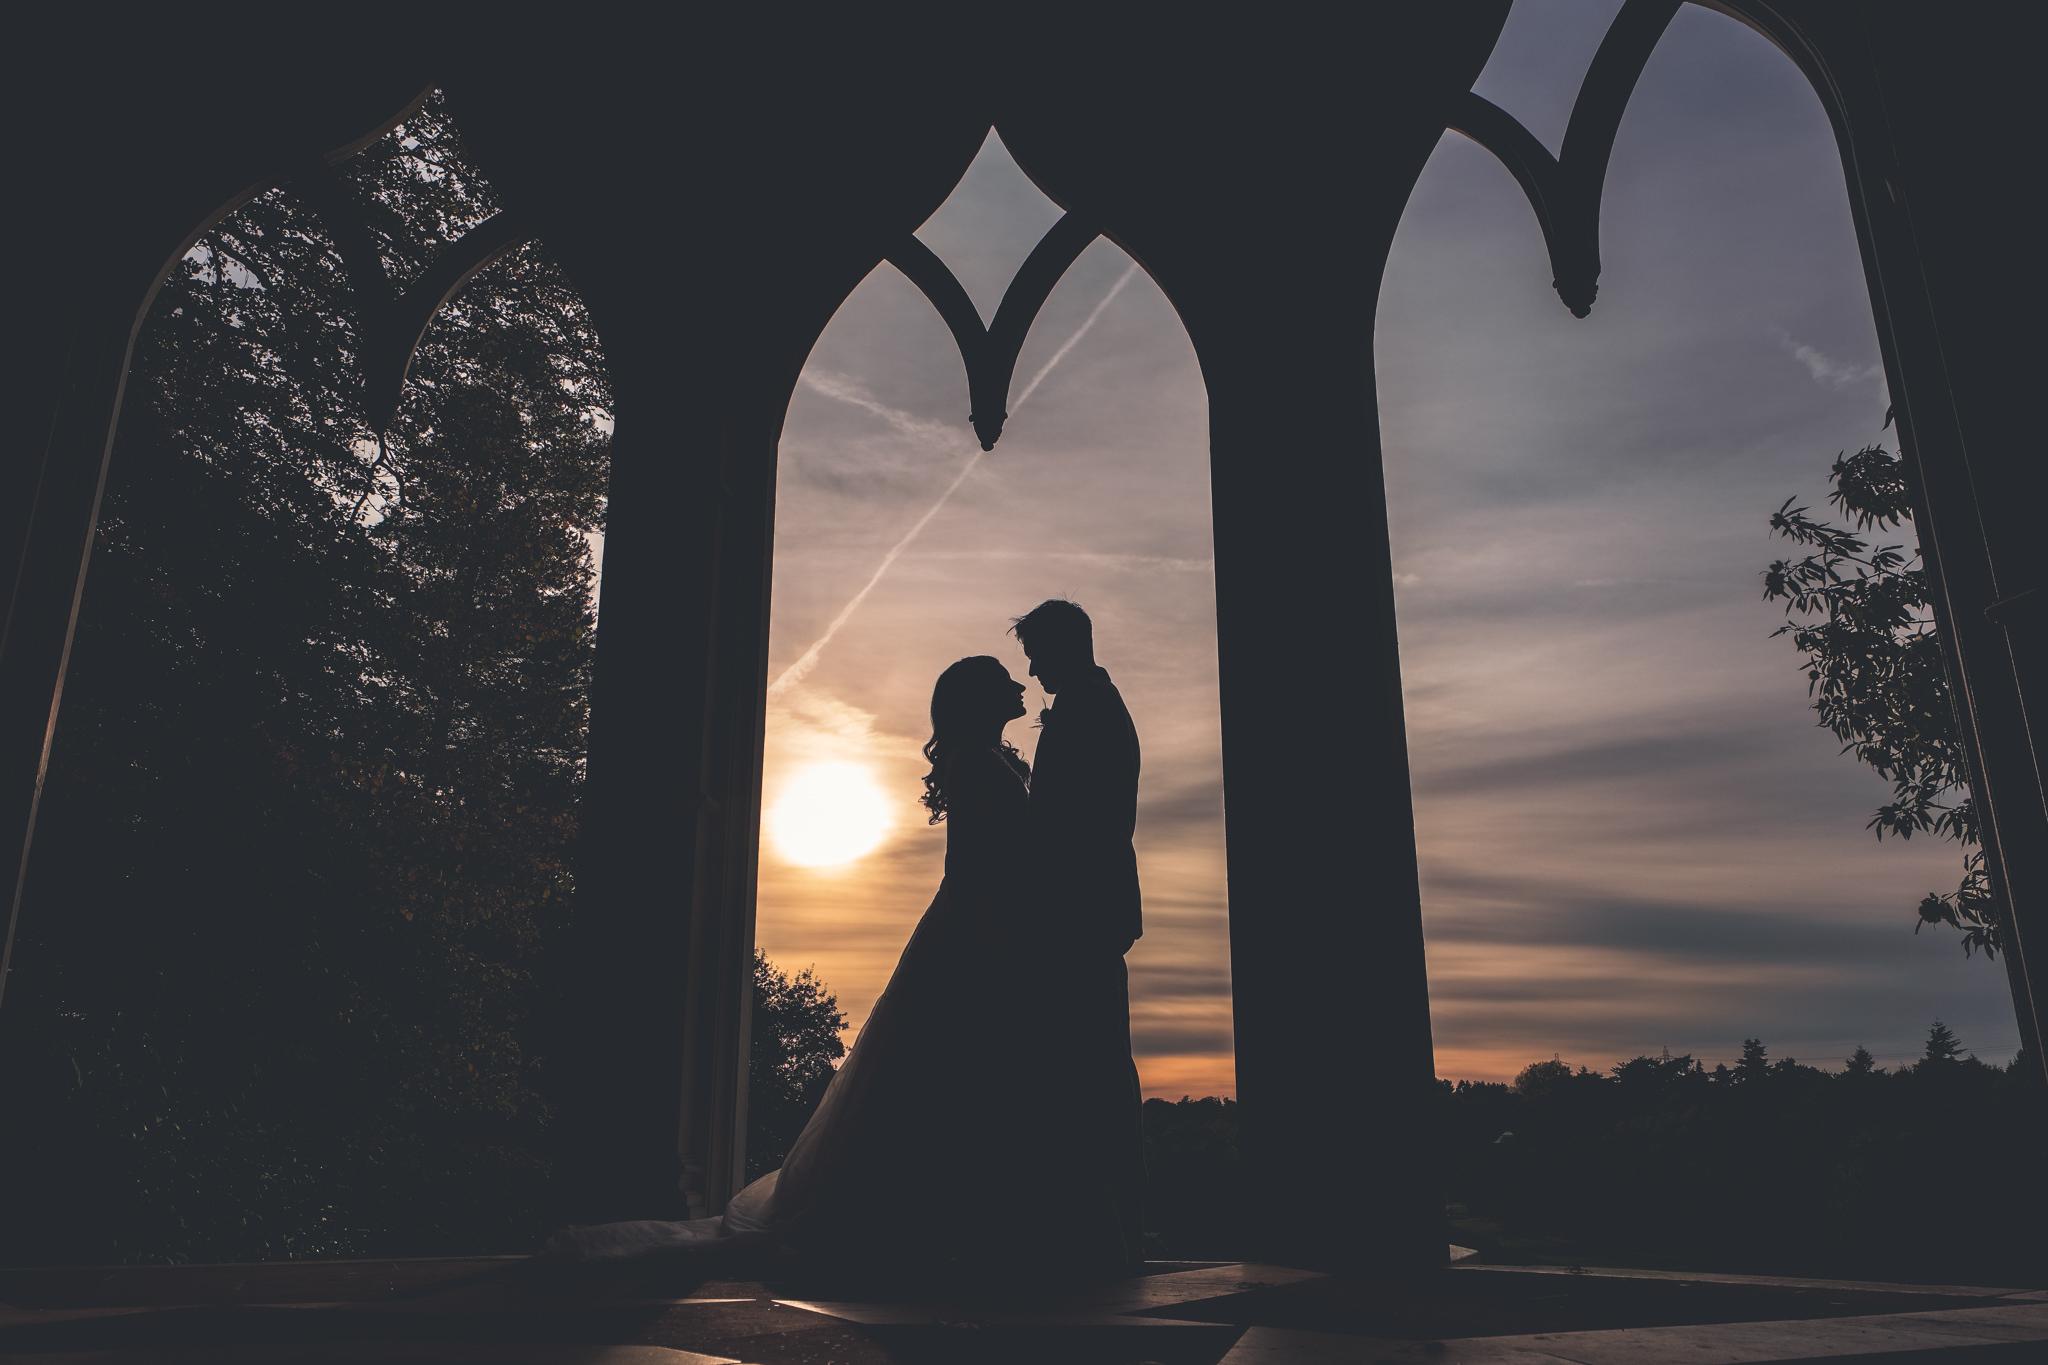 Painshill Park Wedding Photography - Suki and Ricky